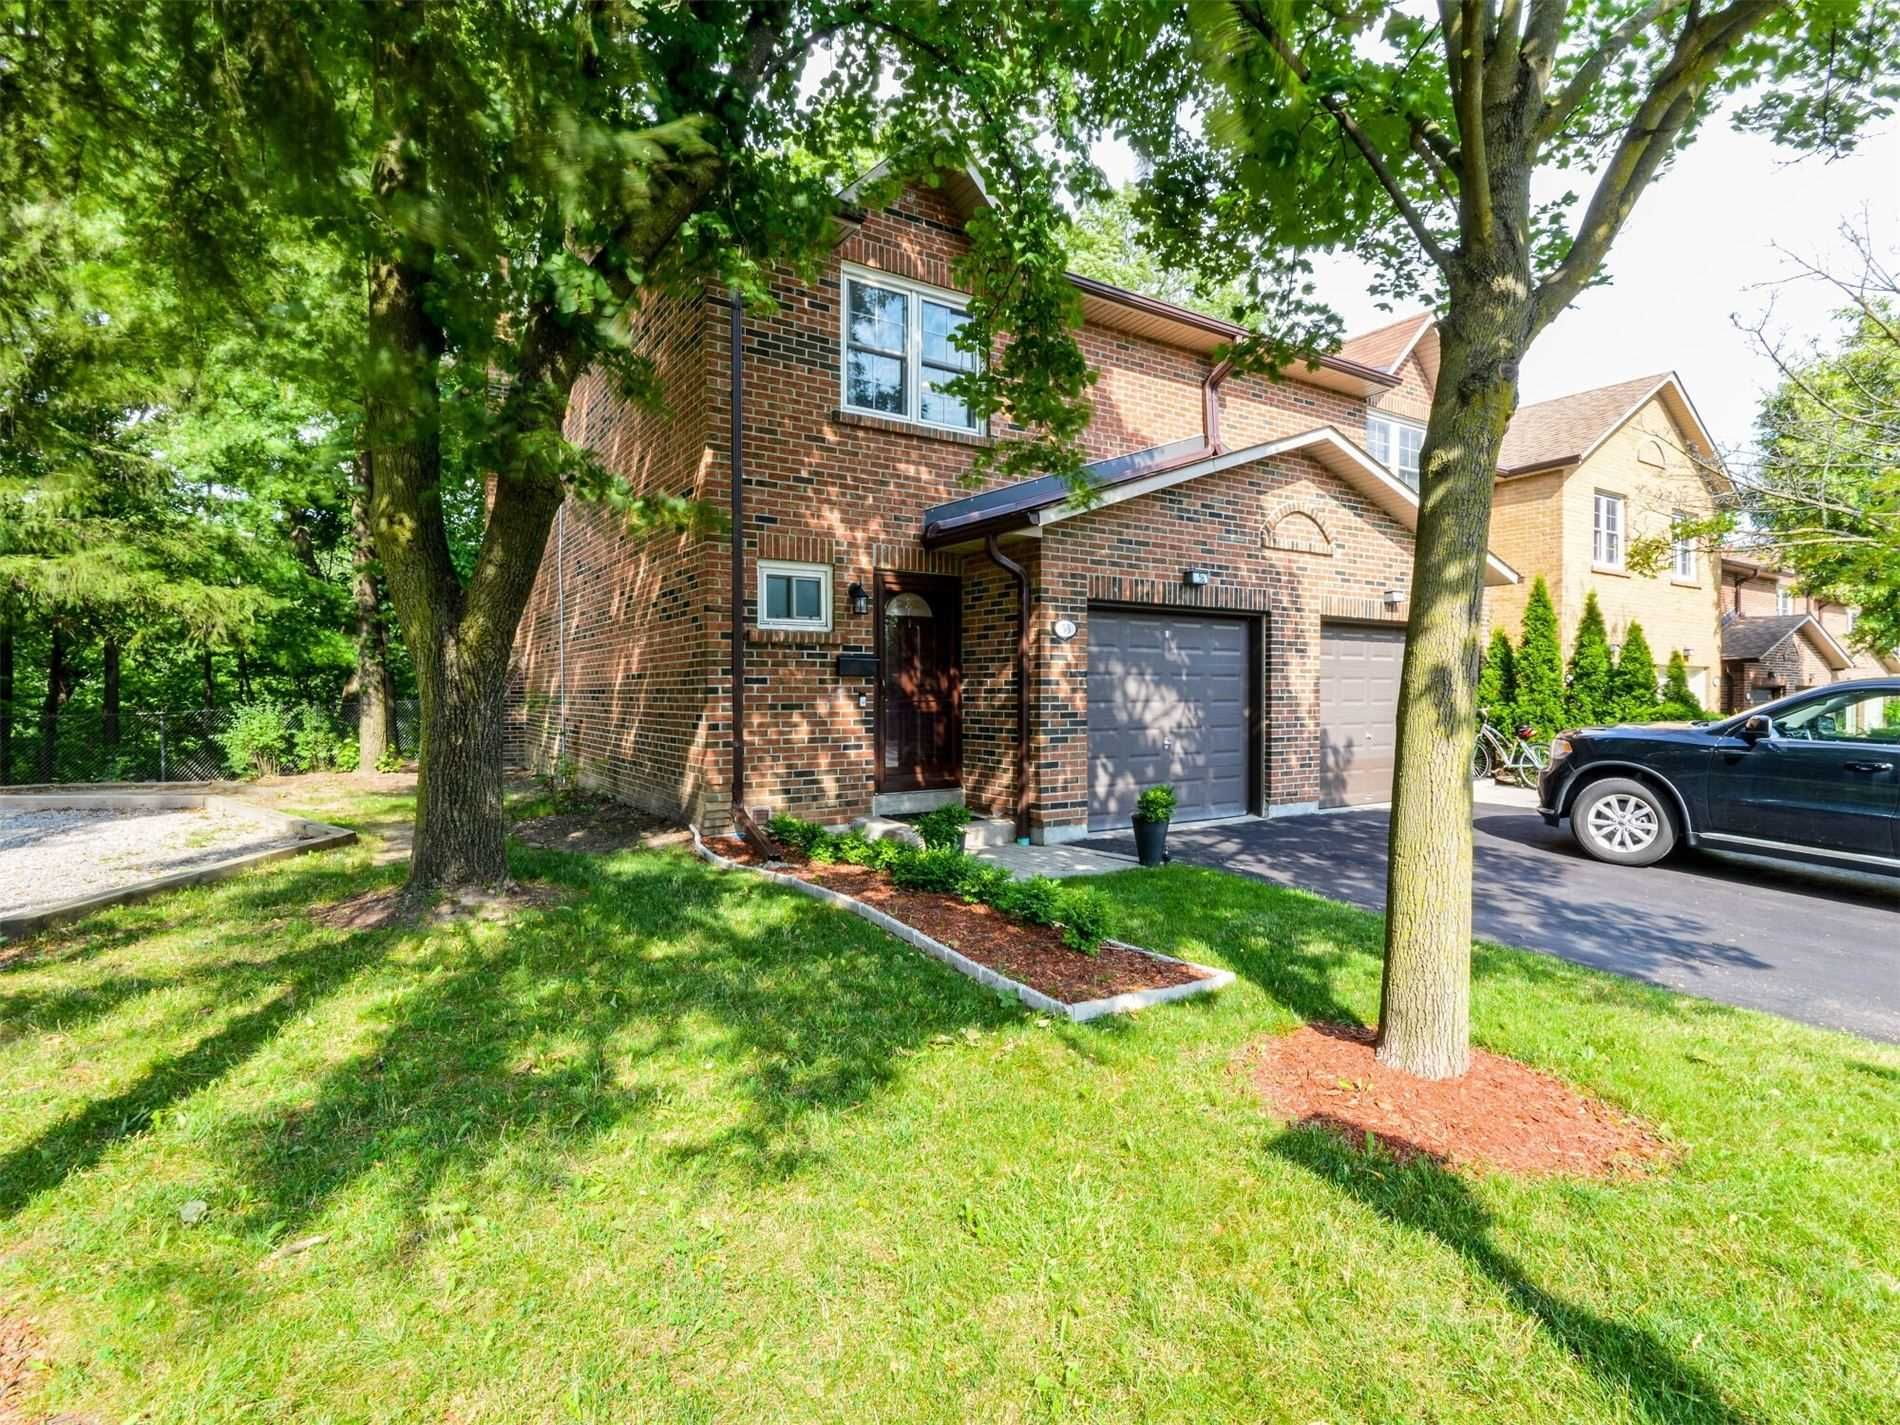 Main Photo: 53 2120 Rathburn Road in Mississauga: Rathwood Condo for sale : MLS®# W5310866